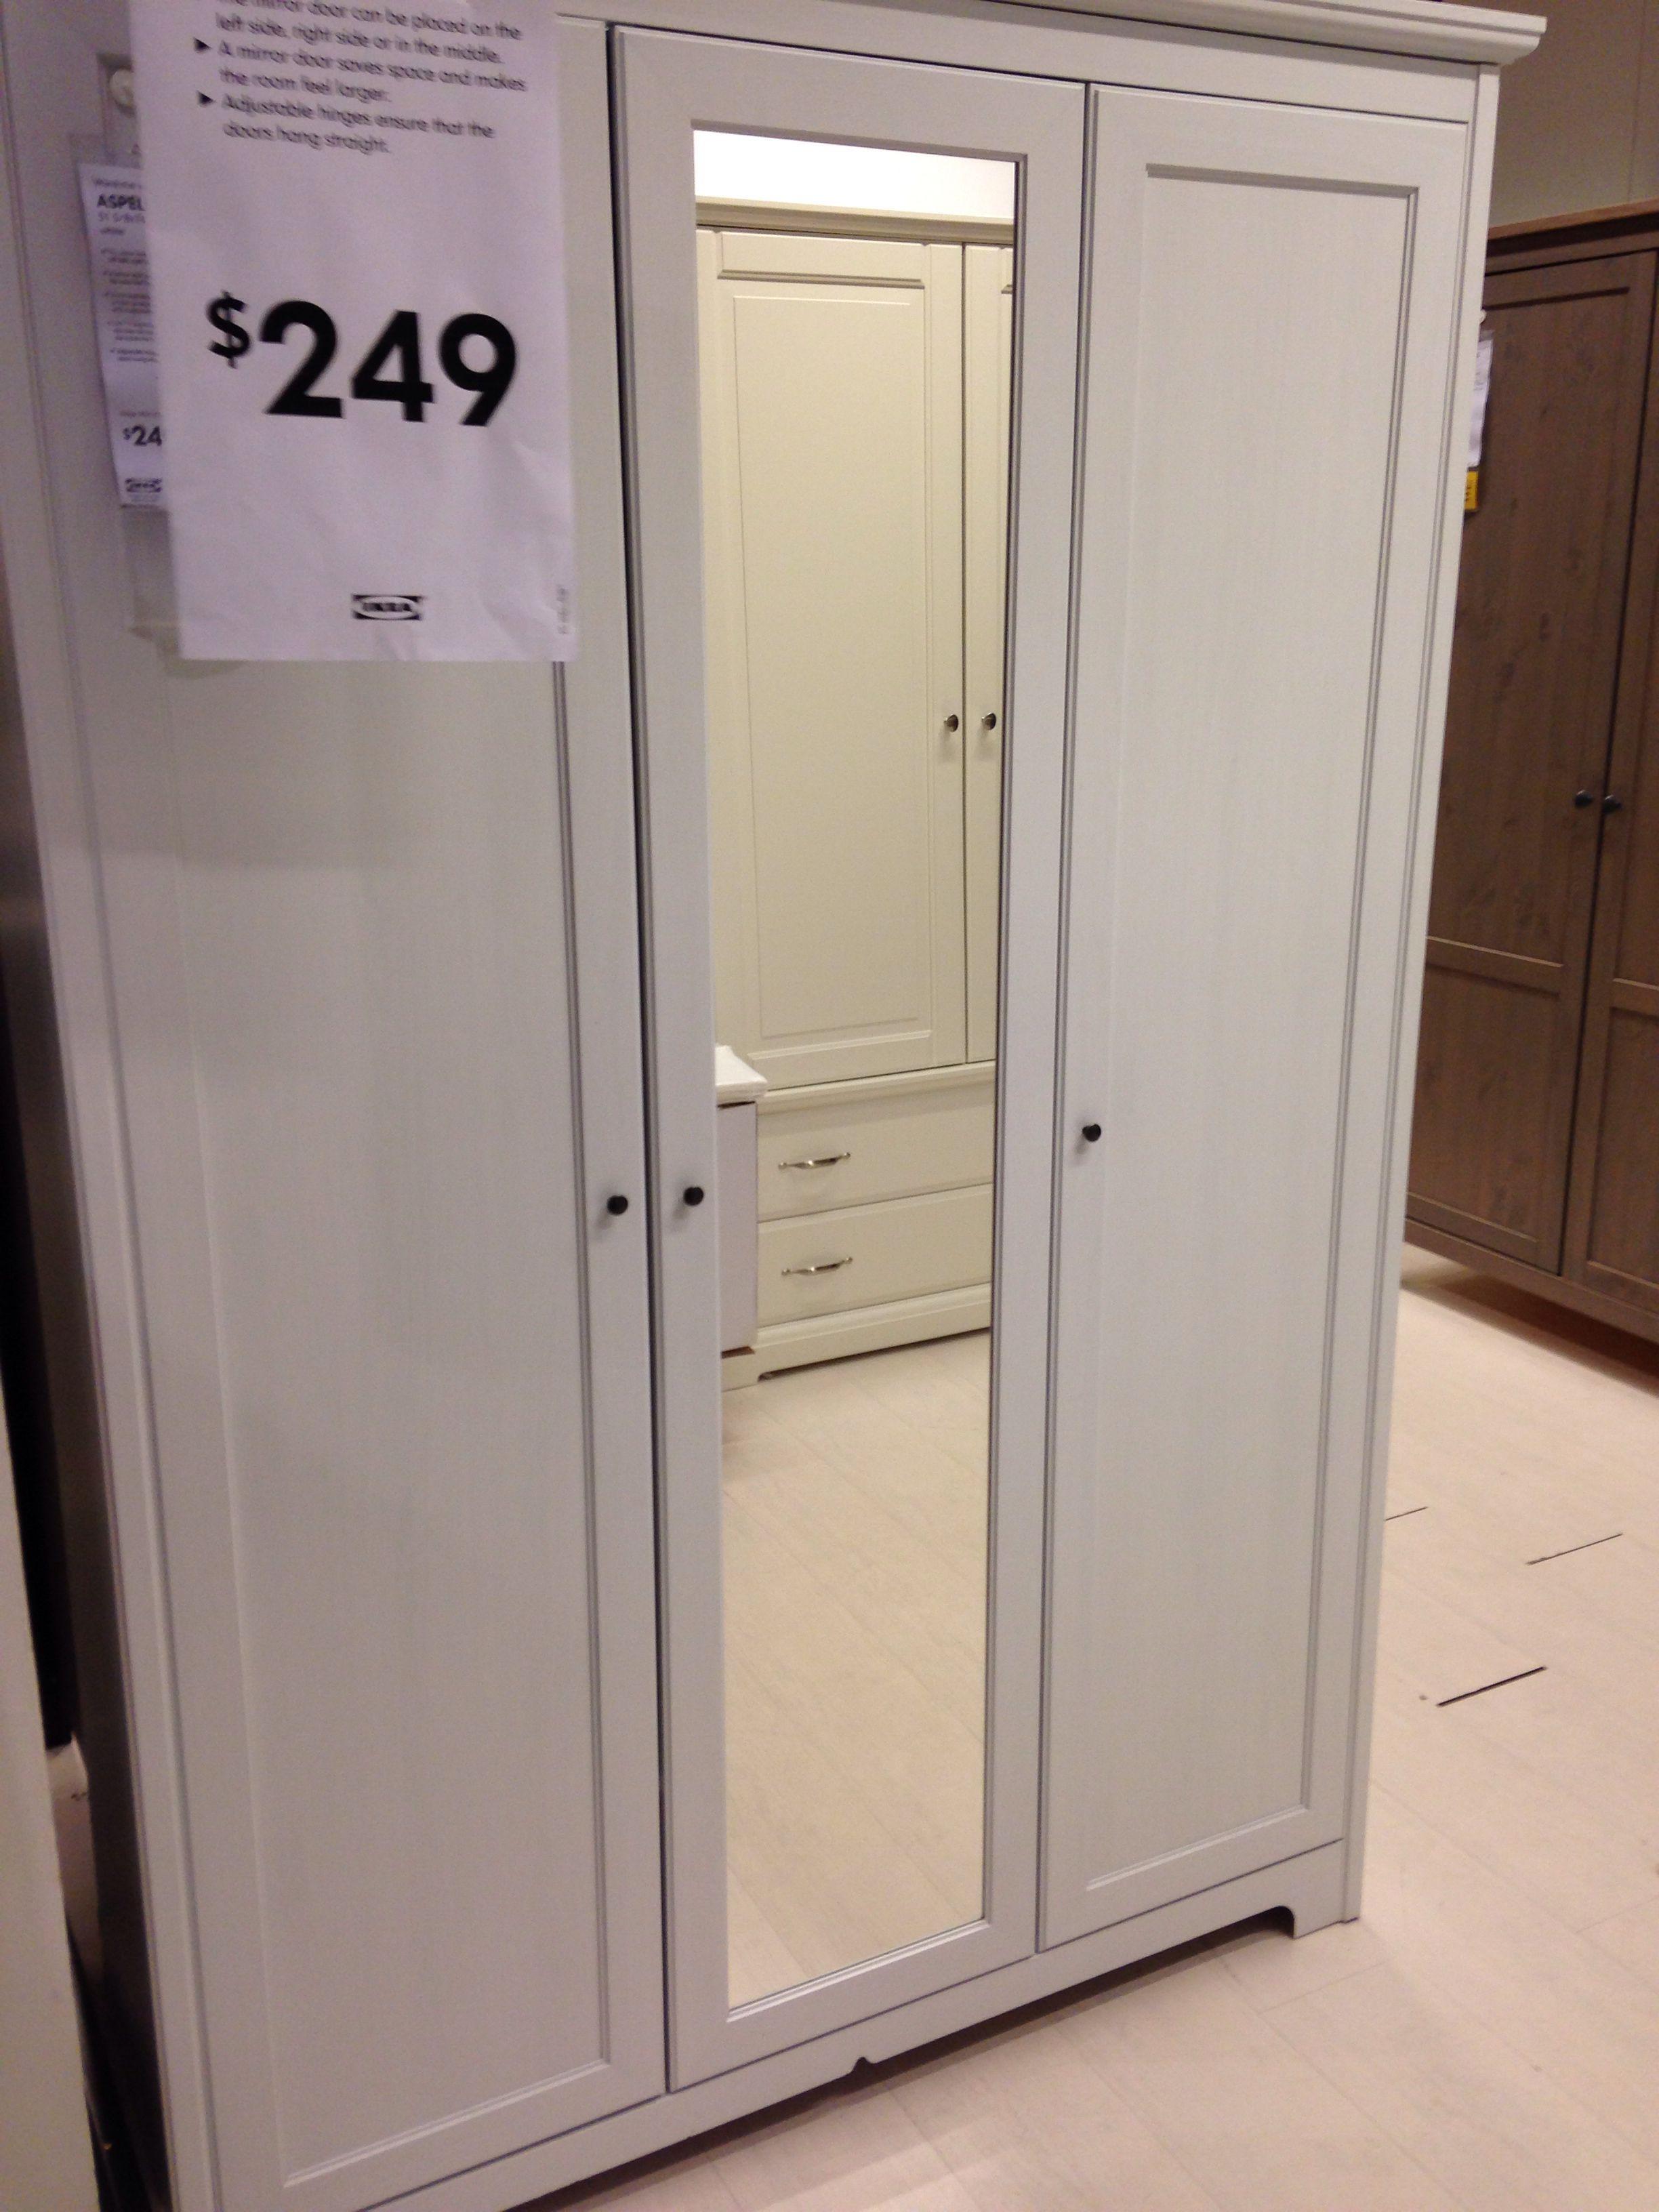 aspelund ikea wardrobe reviews. Black Bedroom Furniture Sets. Home Design Ideas